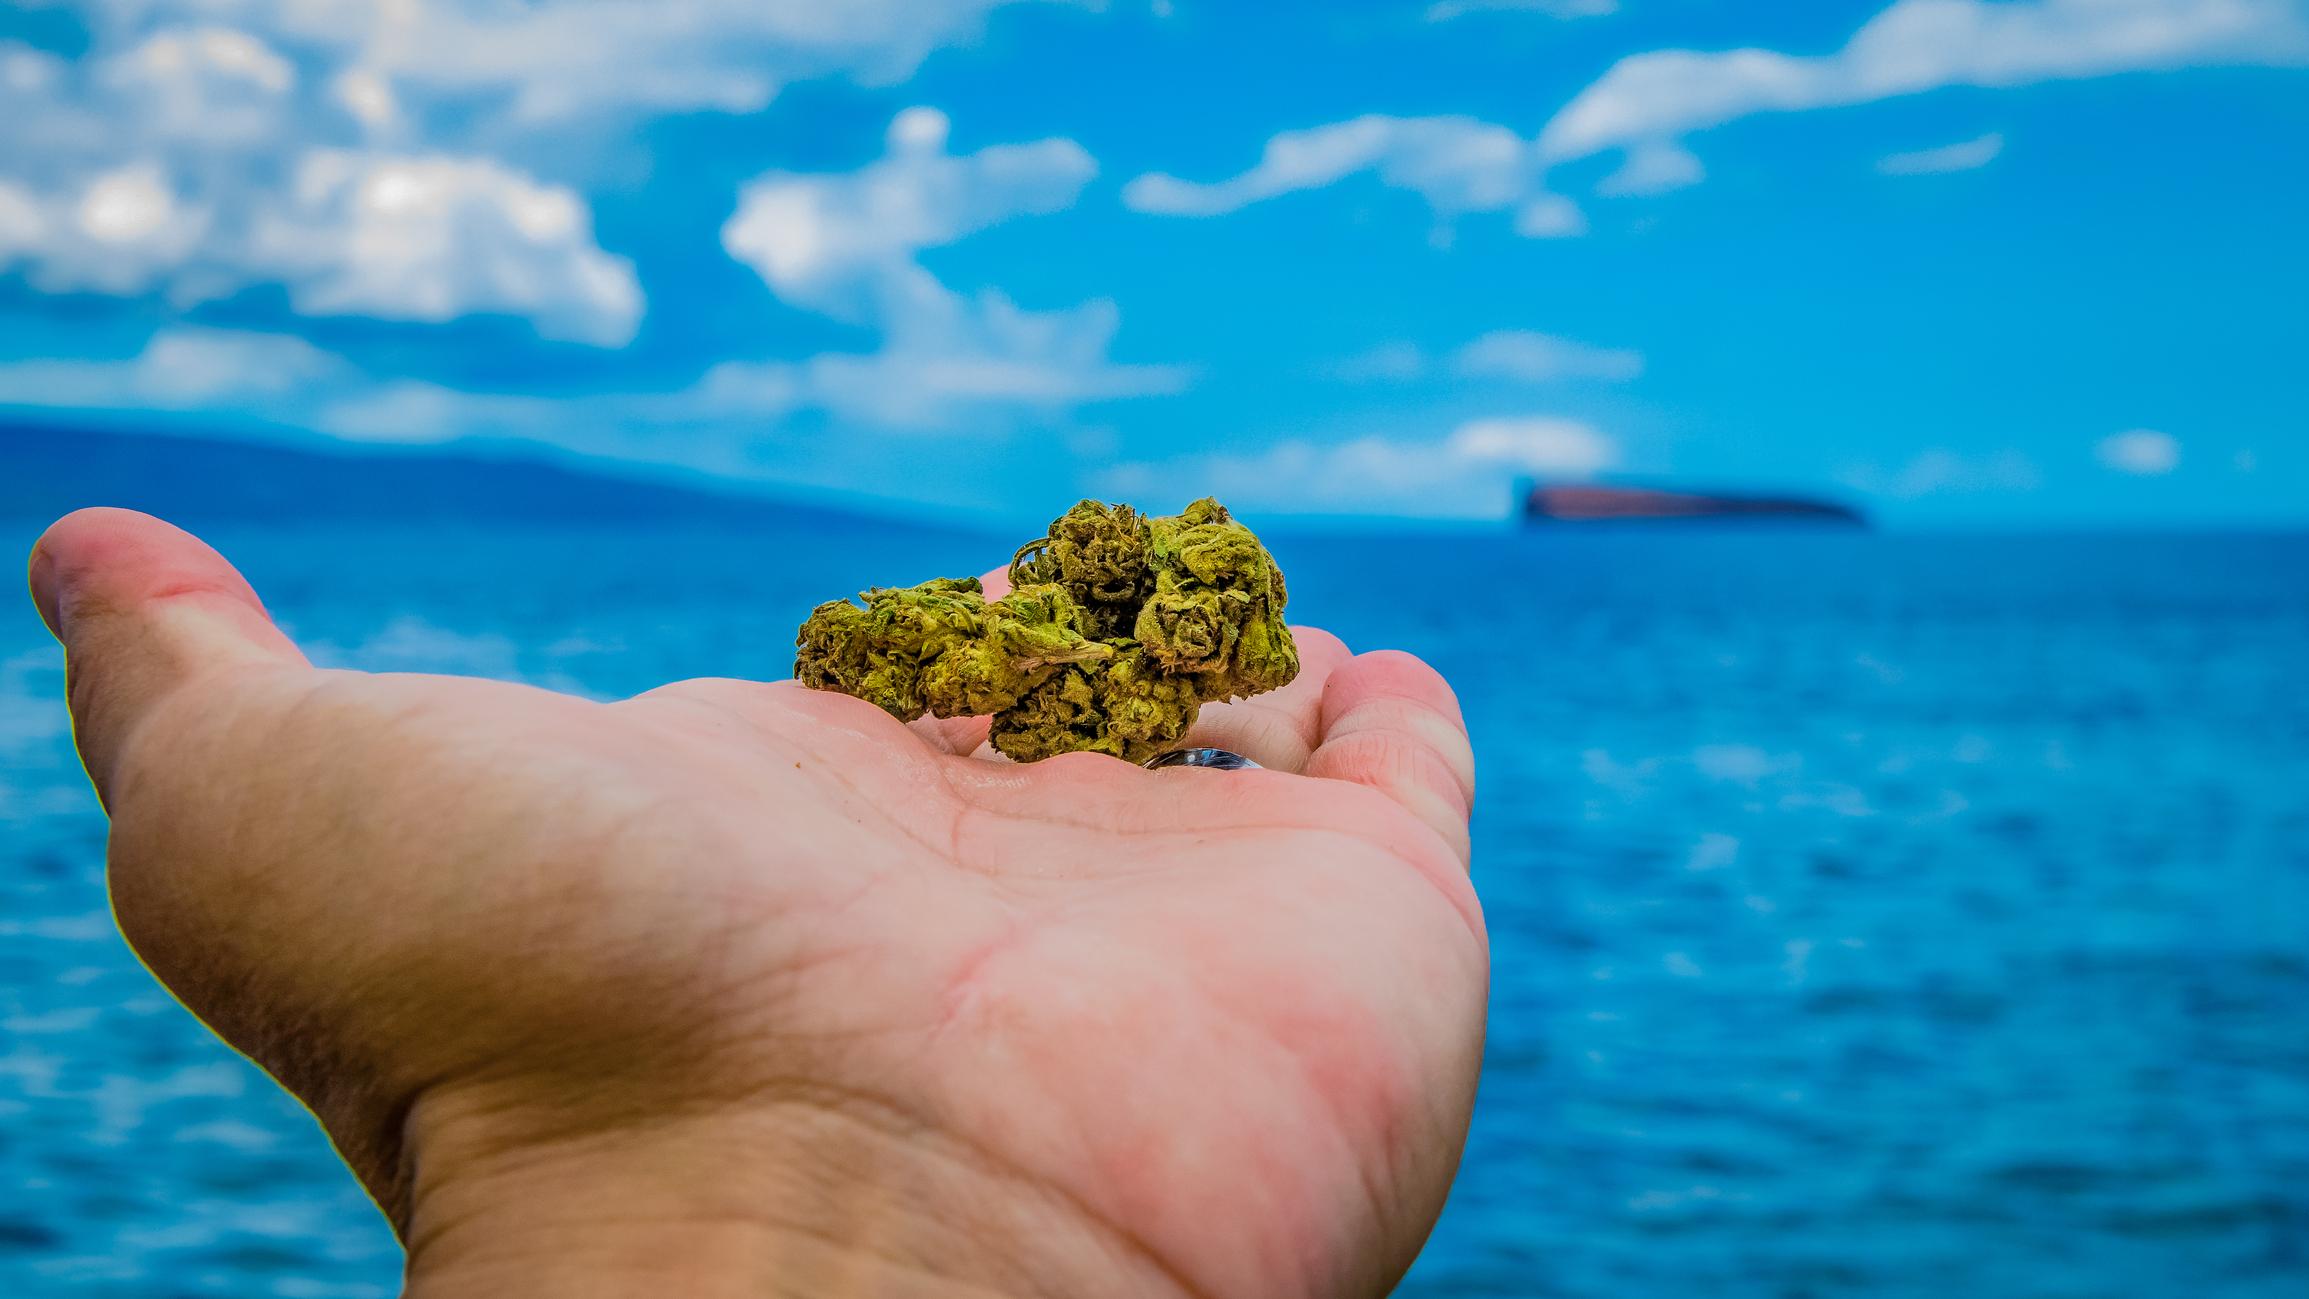 Palm holding marijuana buds extended towards the ocean